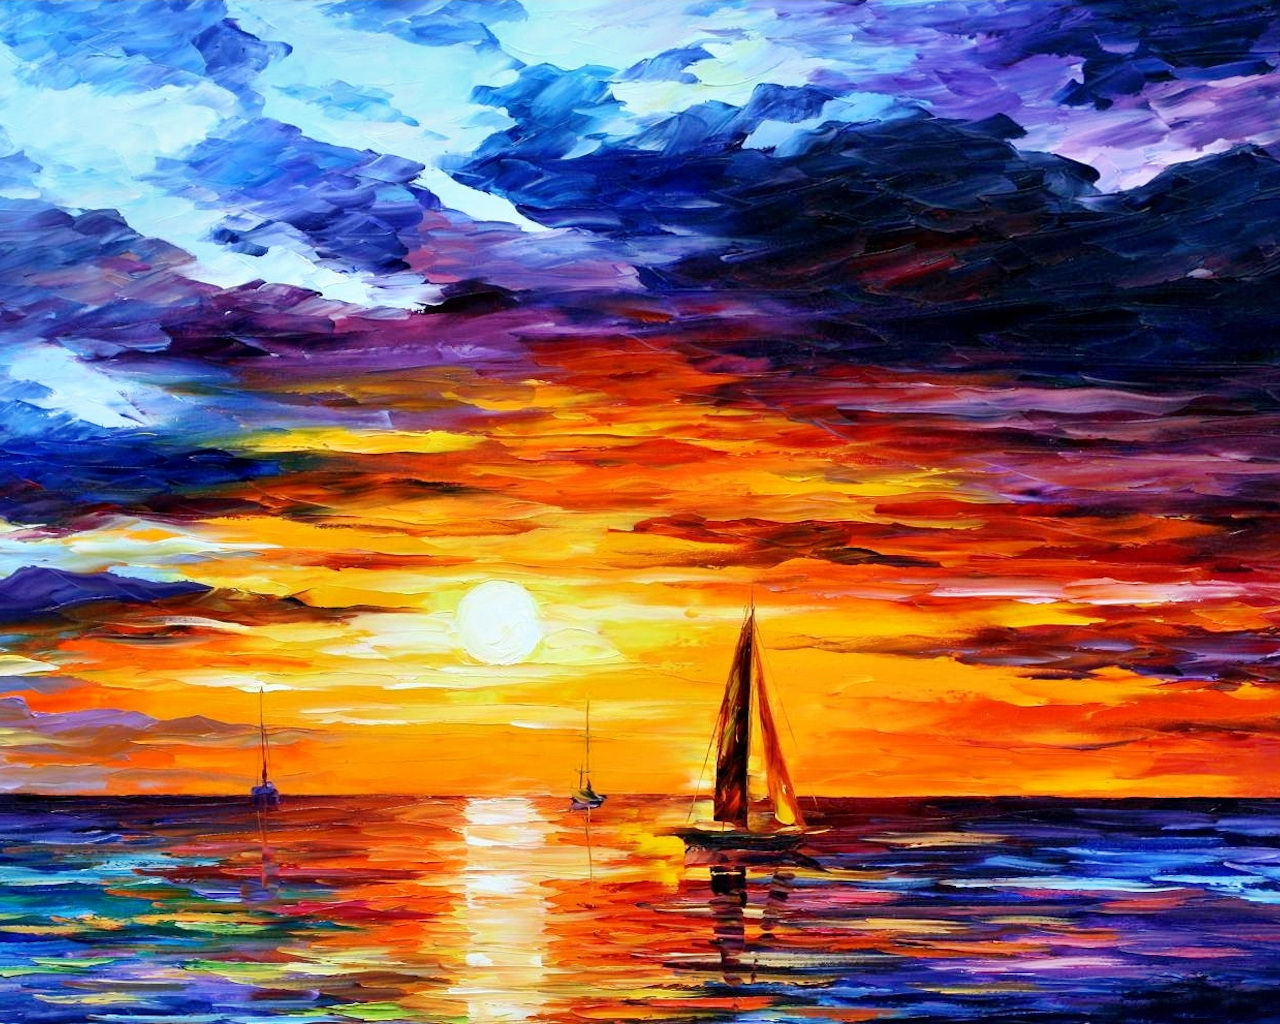 http://2.bp.blogspot.com/-E4BlIZvX1I4/TZN-nlF5nmI/AAAAAAAAAAg/ZHrsZ8cgyX4/s1600/pintura_del_ocaso-573686.jpeg